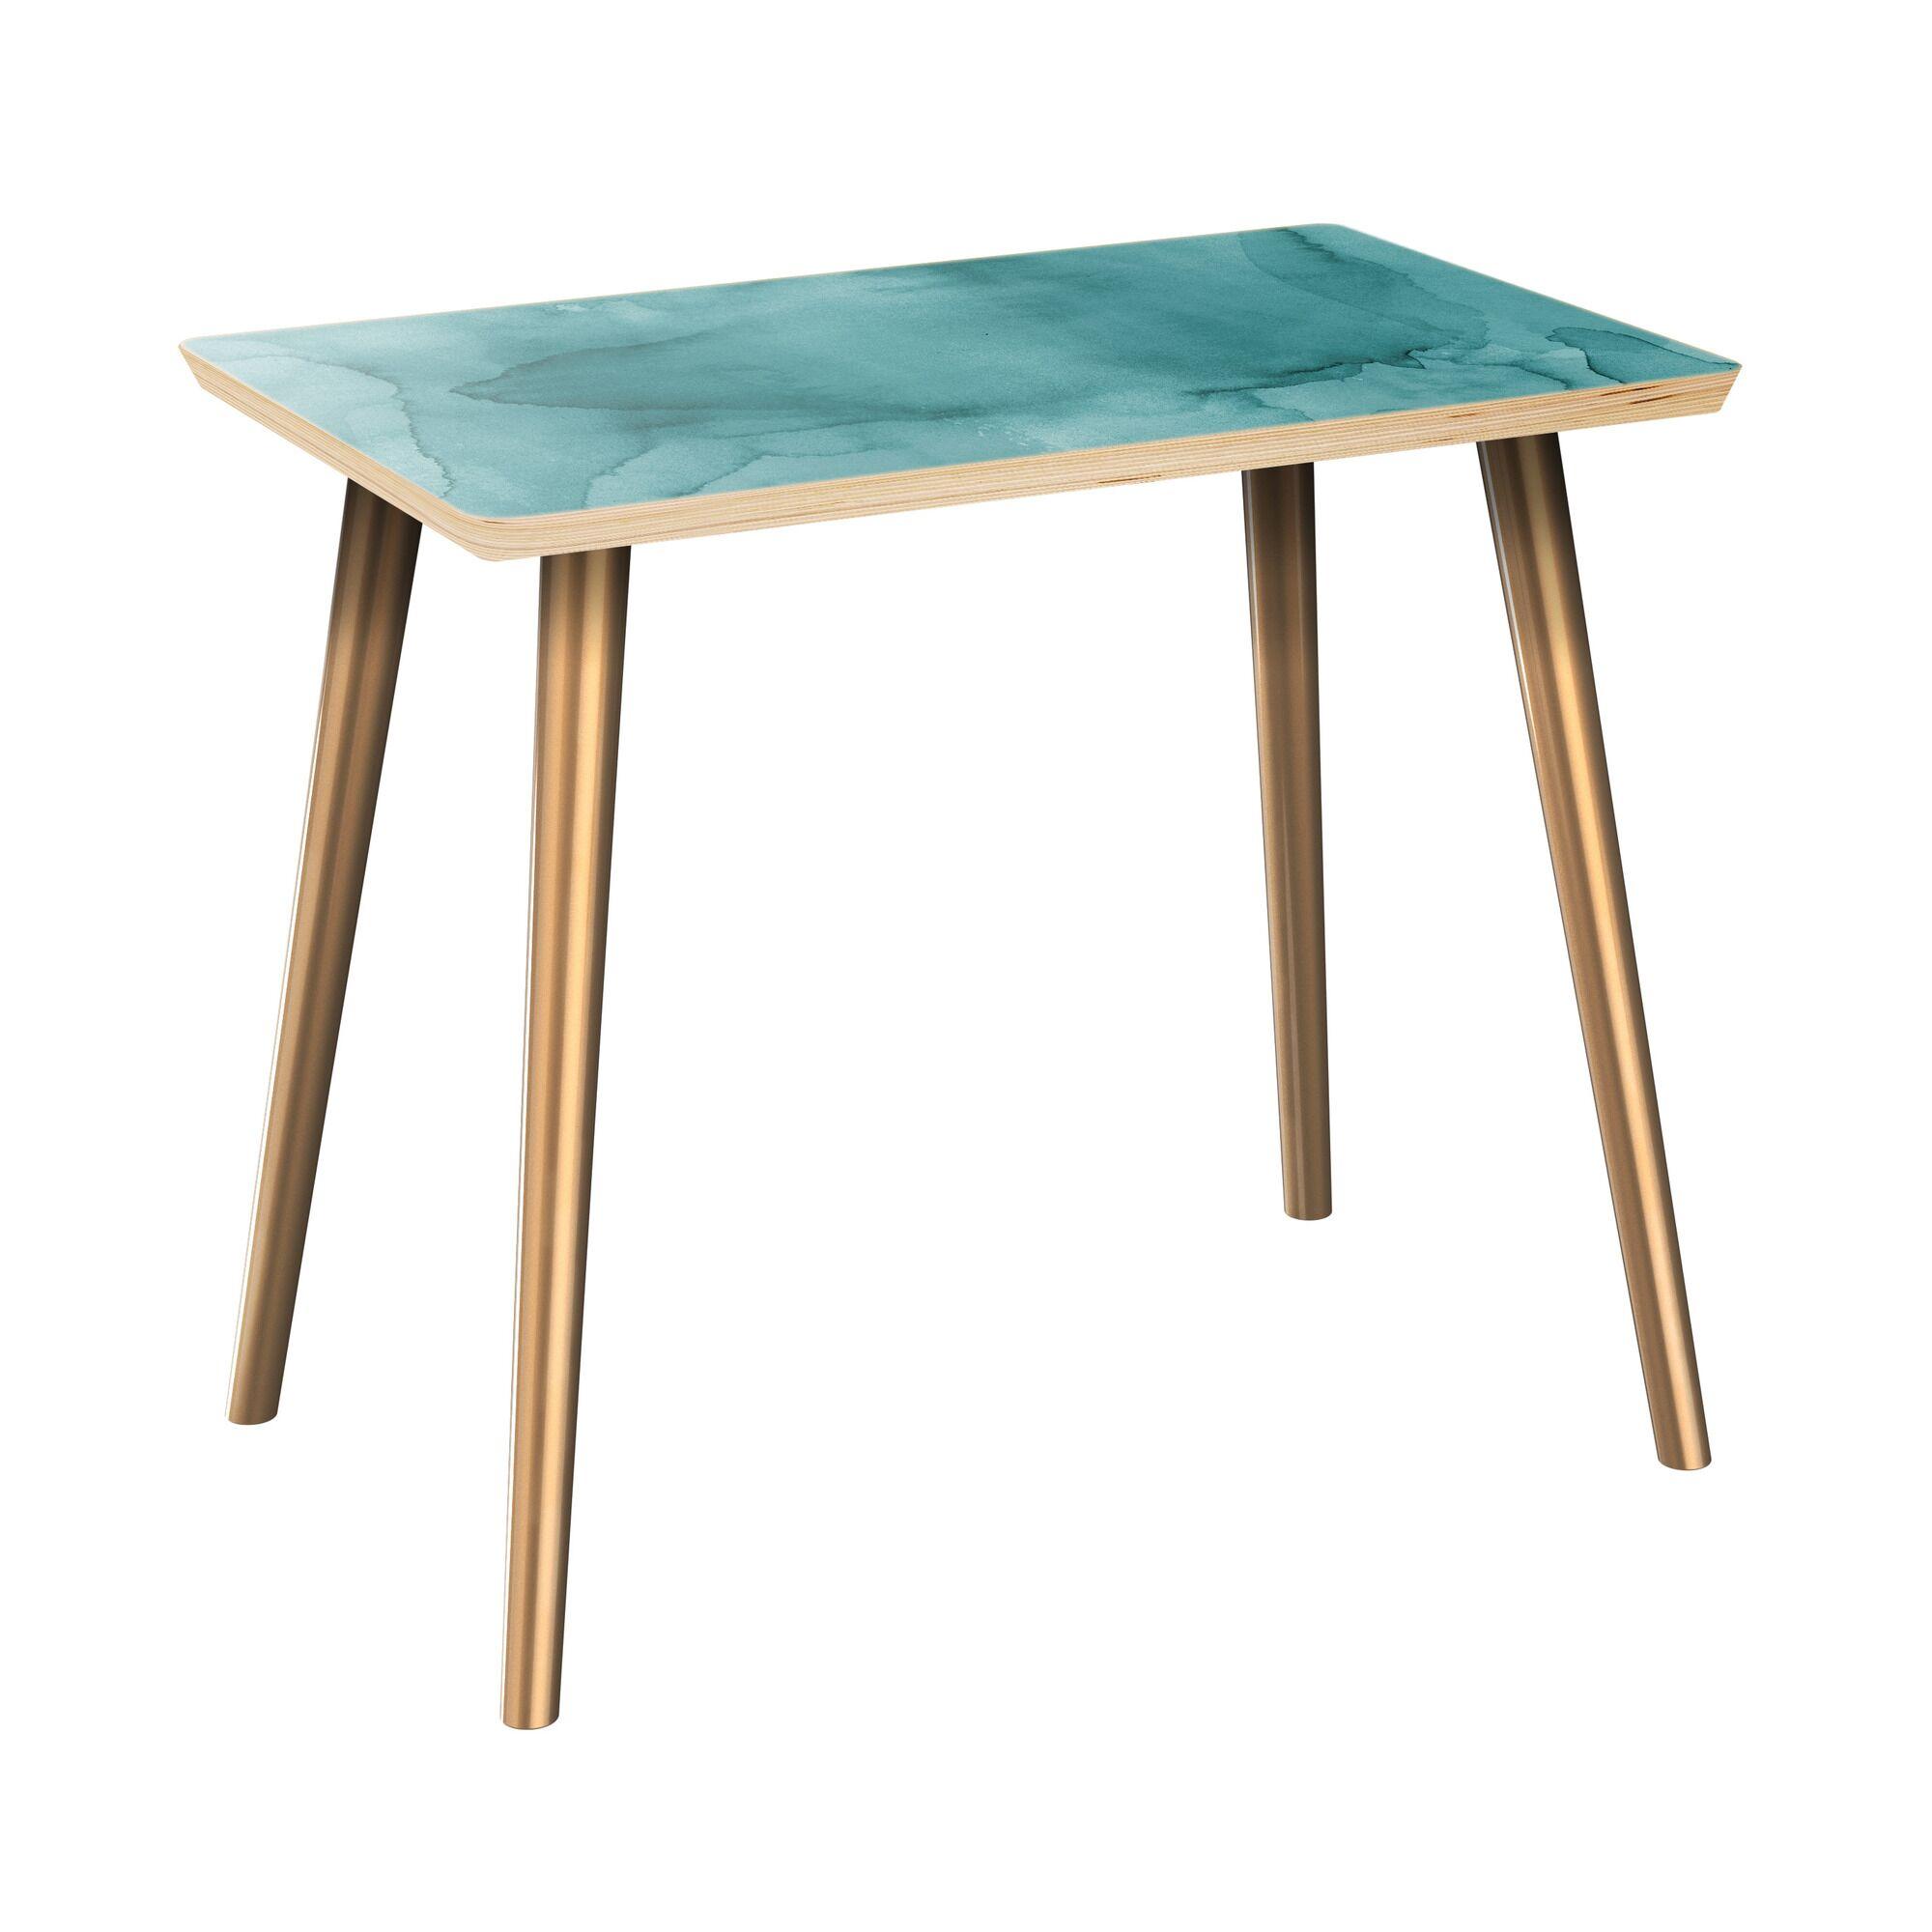 Jaqueline End Table Table Top Boarder Color: Natural, Table Base Color: Brass, Table Top Color: Gray/Black